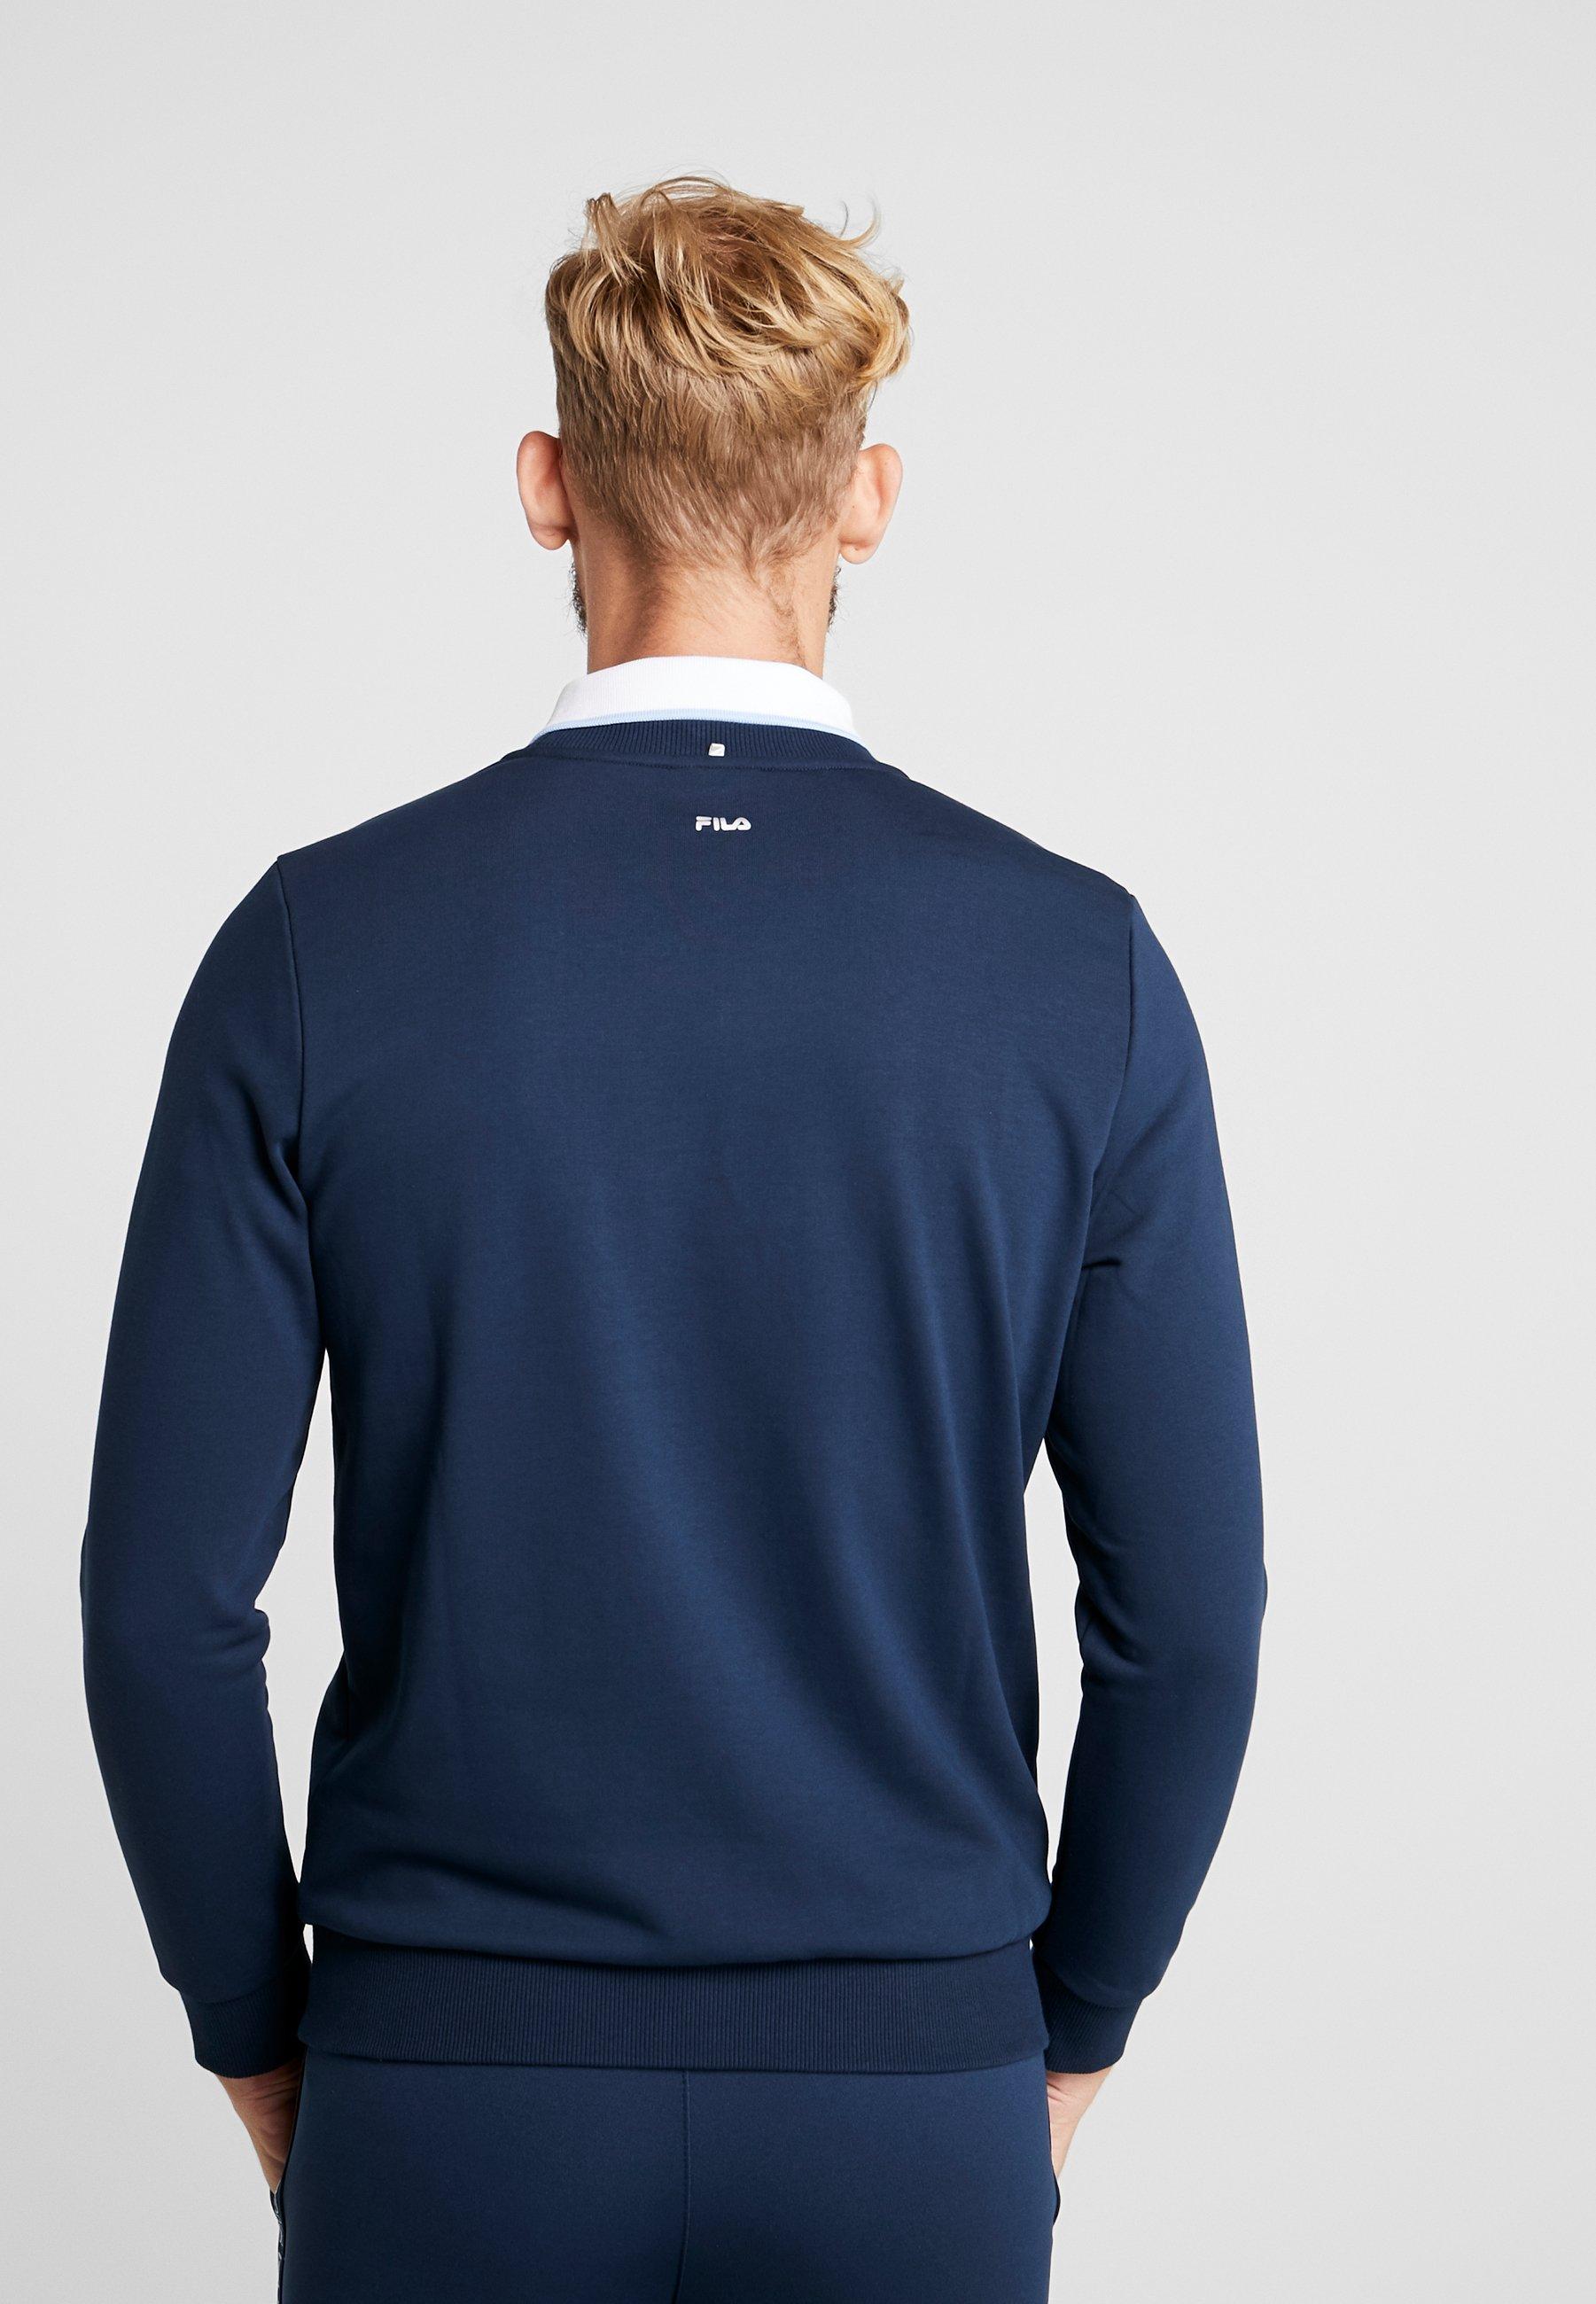 Fila ROCCO - Sweatshirt peacoat blue